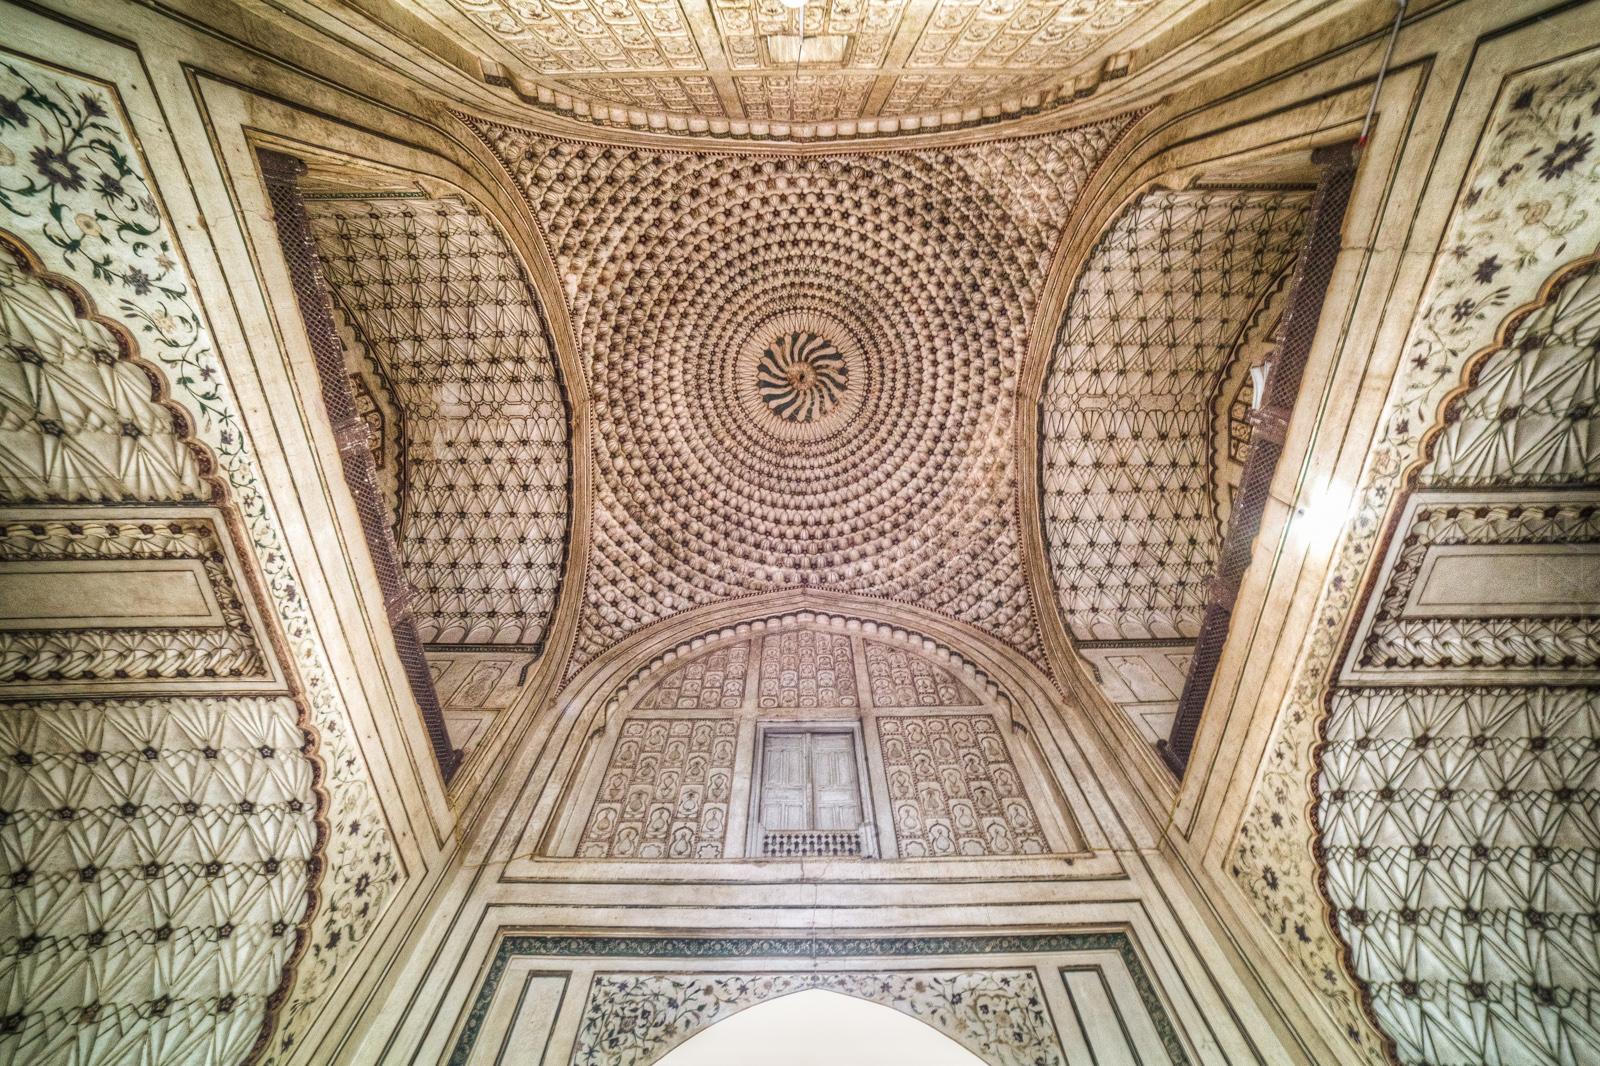 Bibi Ka Maqbara - Gateway's Ceiling